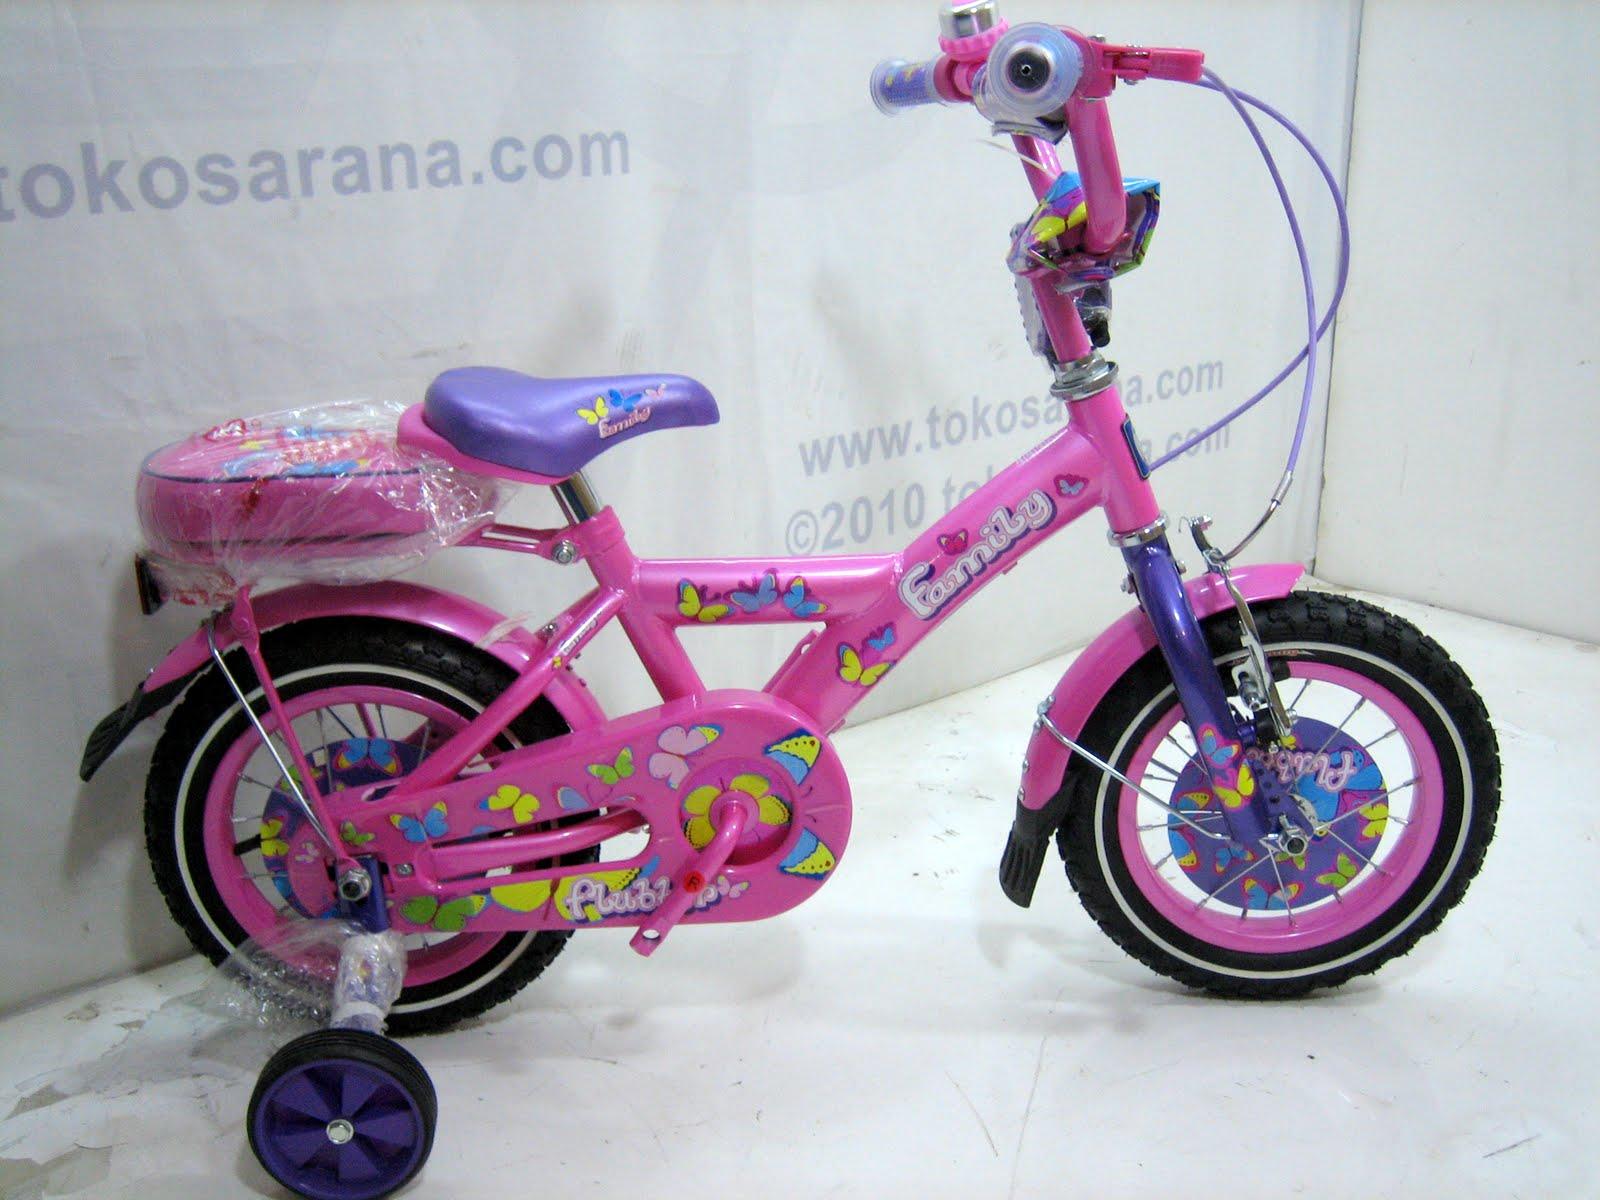 tokosarana™Jakarta   Mahasarana Sukses™Bandung: Sepeda